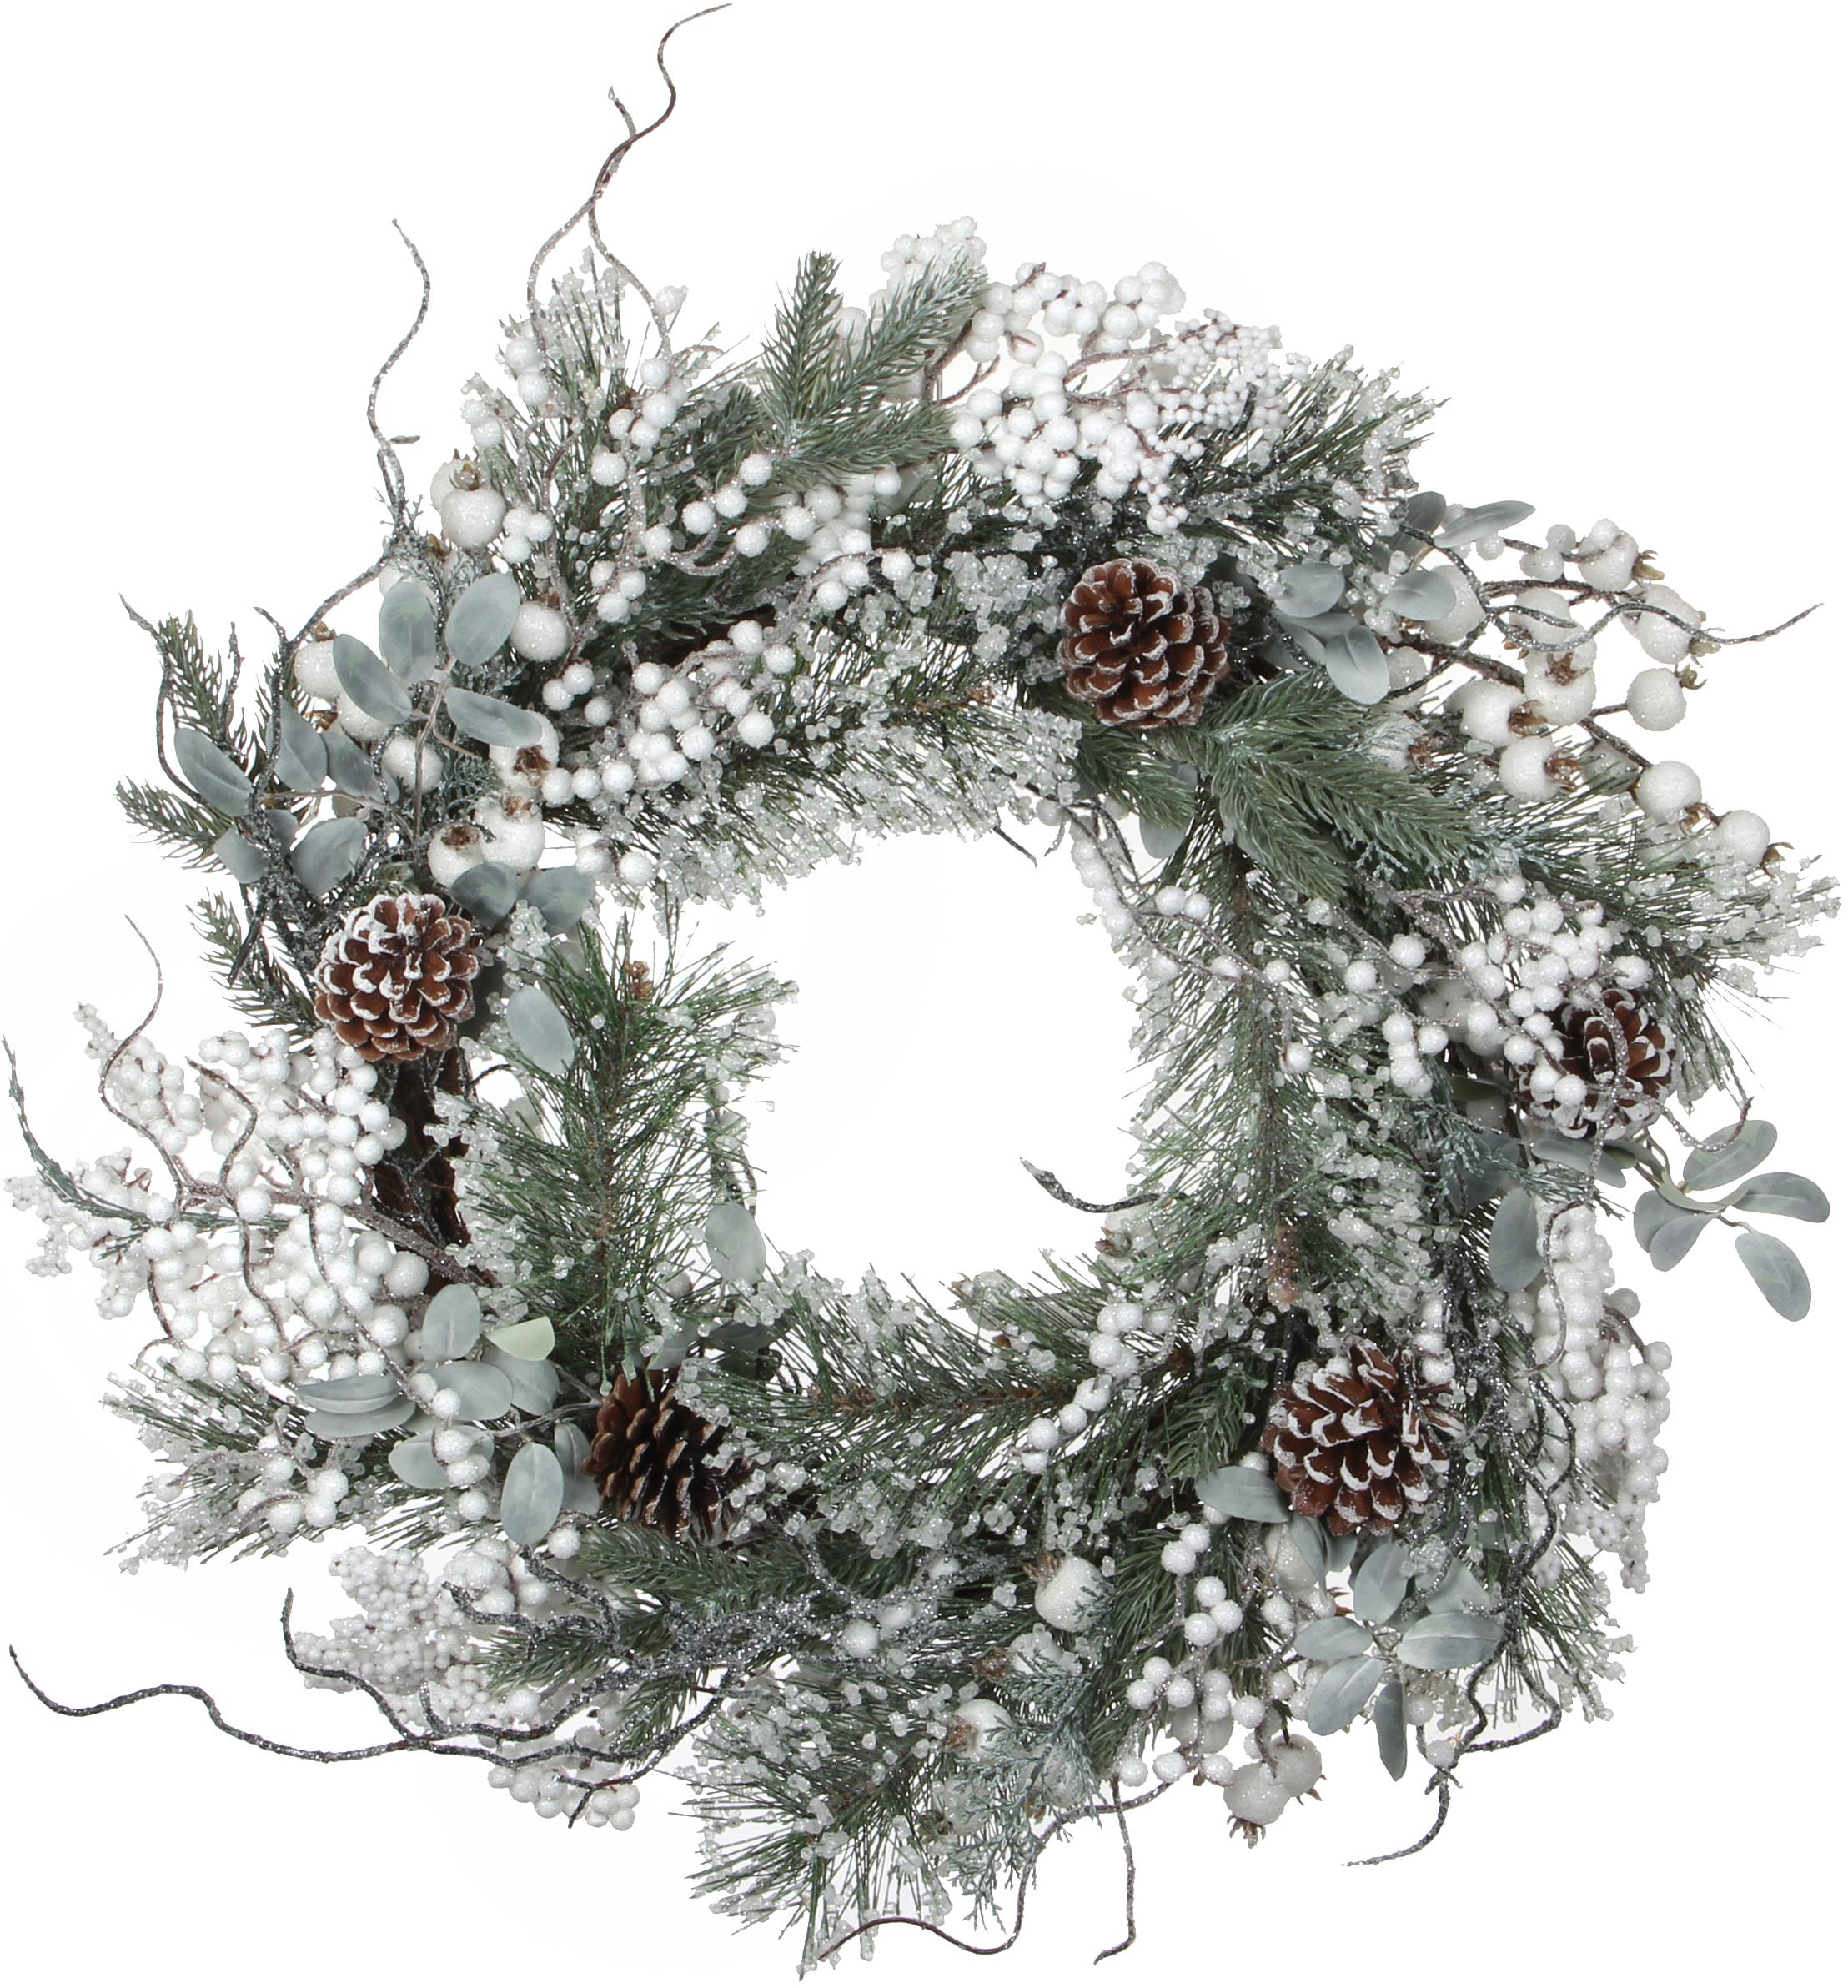 Ghirlanda natalizia artificiale Hailey, Materiale sintetico, Verde, bianco, argento, Ø 50 cm